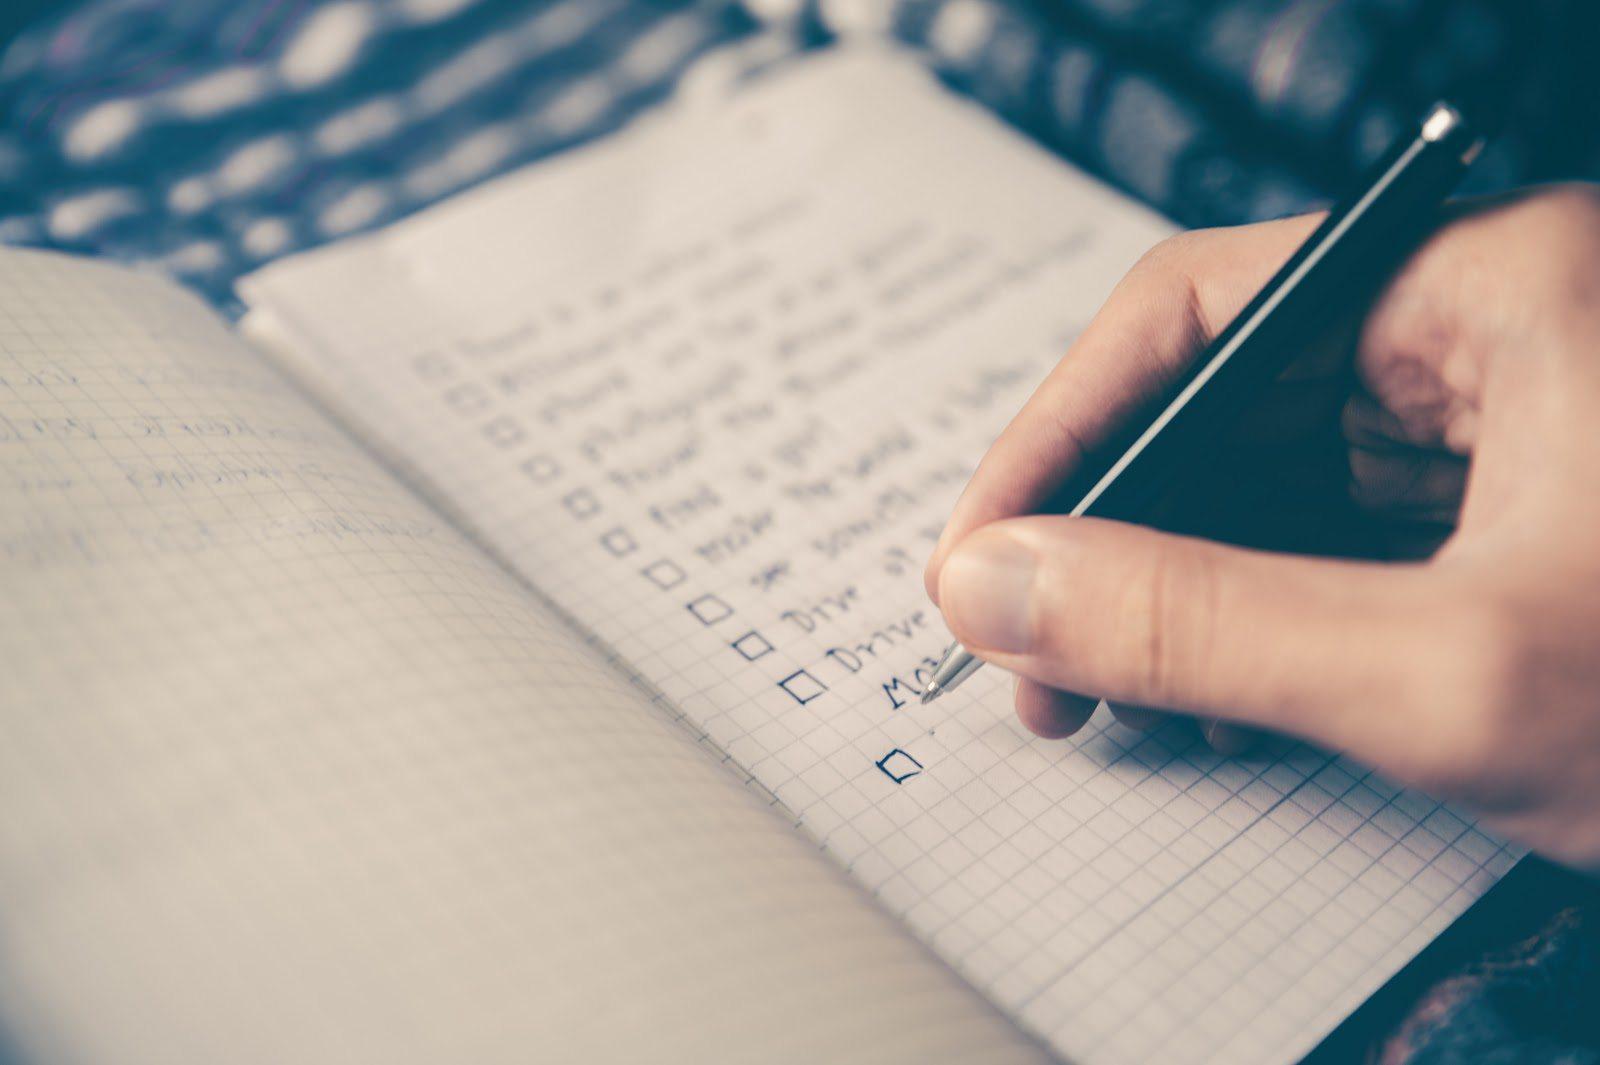 10-Step Checklist for a Final Home Purchase Walkthrough